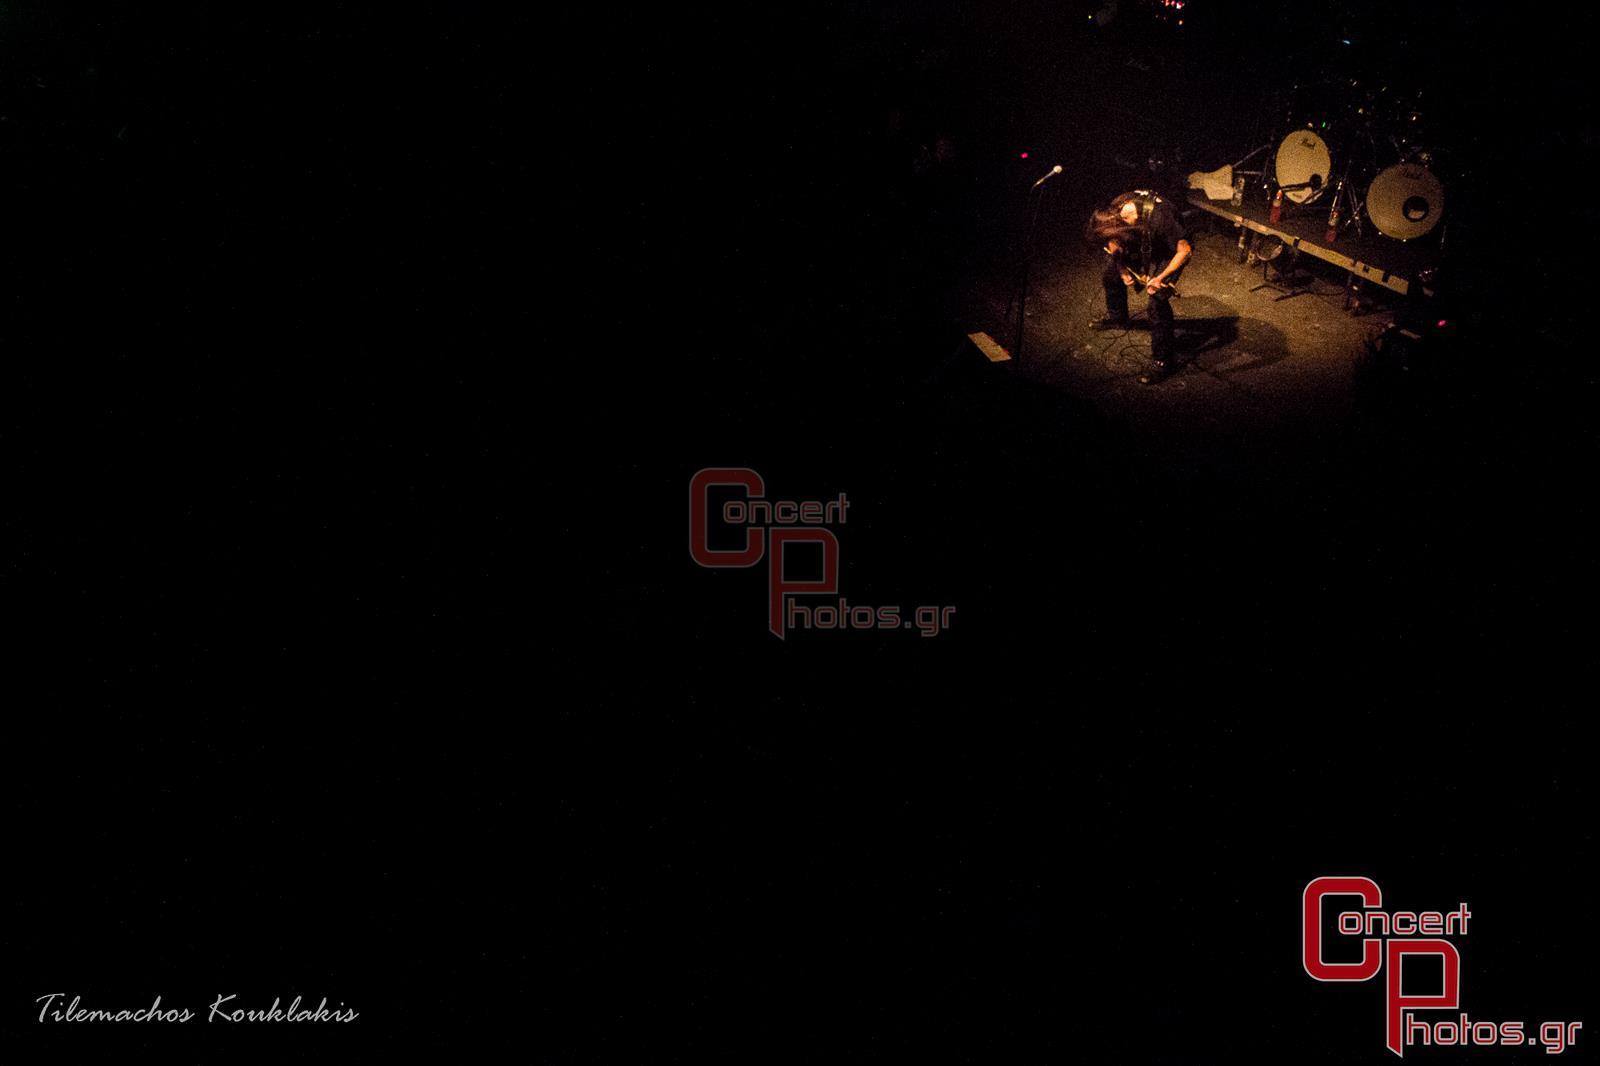 Rotting Christ-Rotting Christ photographer:  - ConcertPhotos-5855